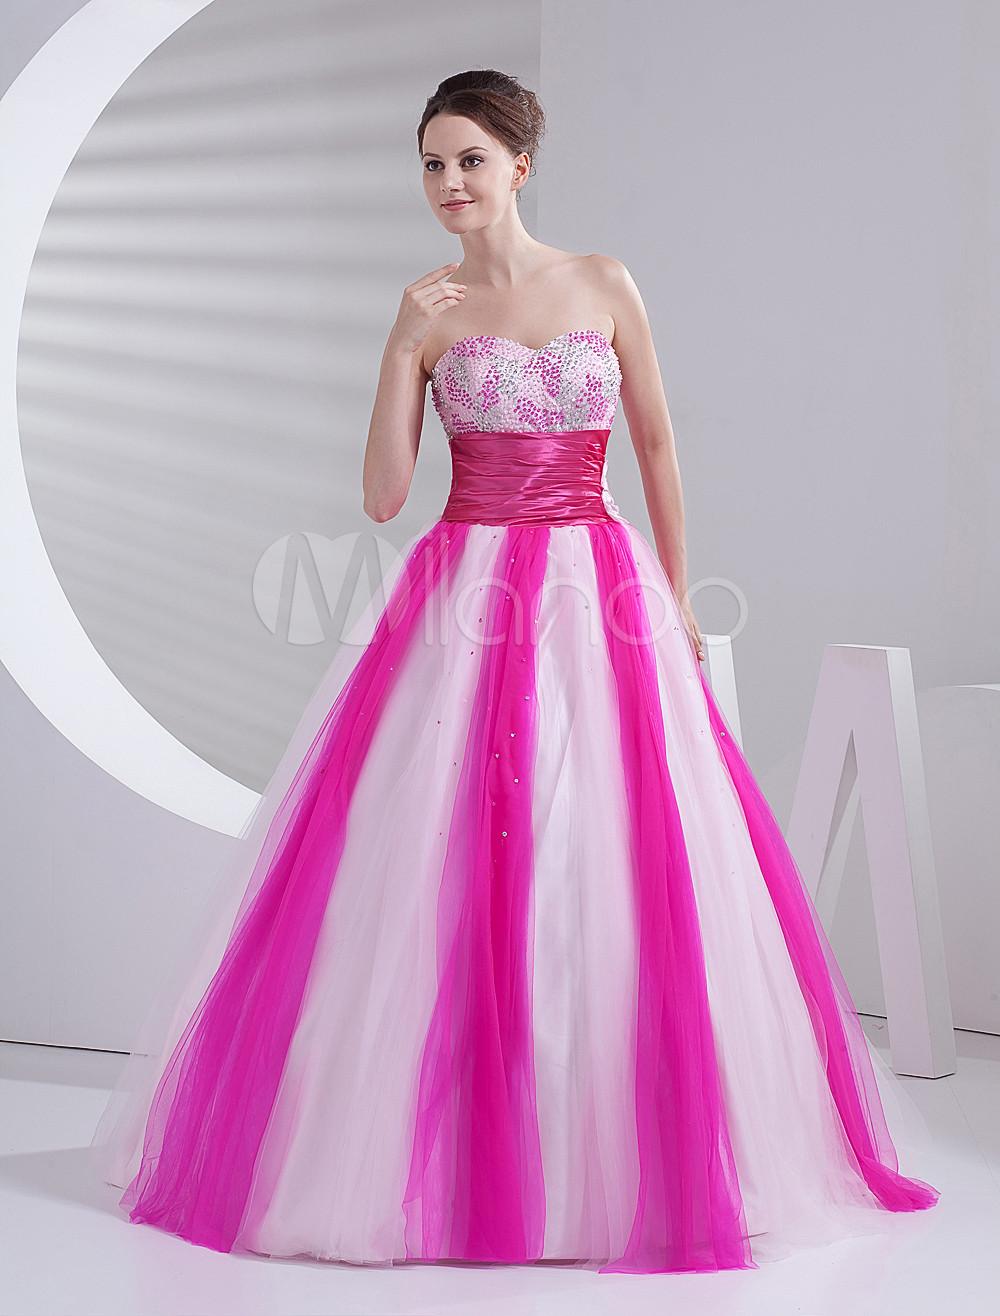 Elegant Ball Gown Pink Tulle Quinceanera Dress - Milanoo.com